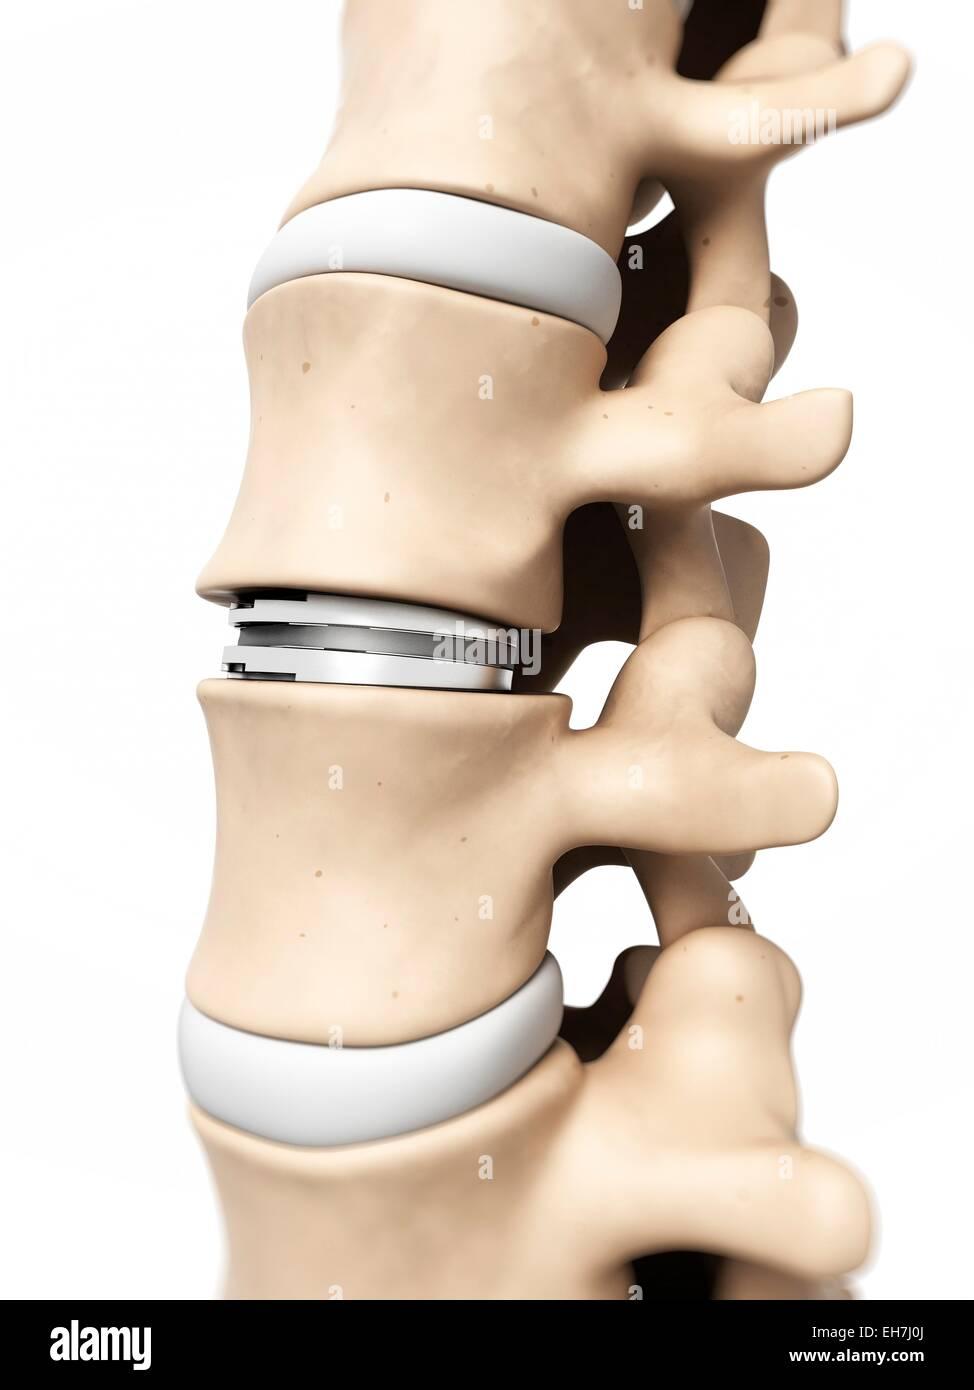 Human vertebrae, illustration - Stock Image